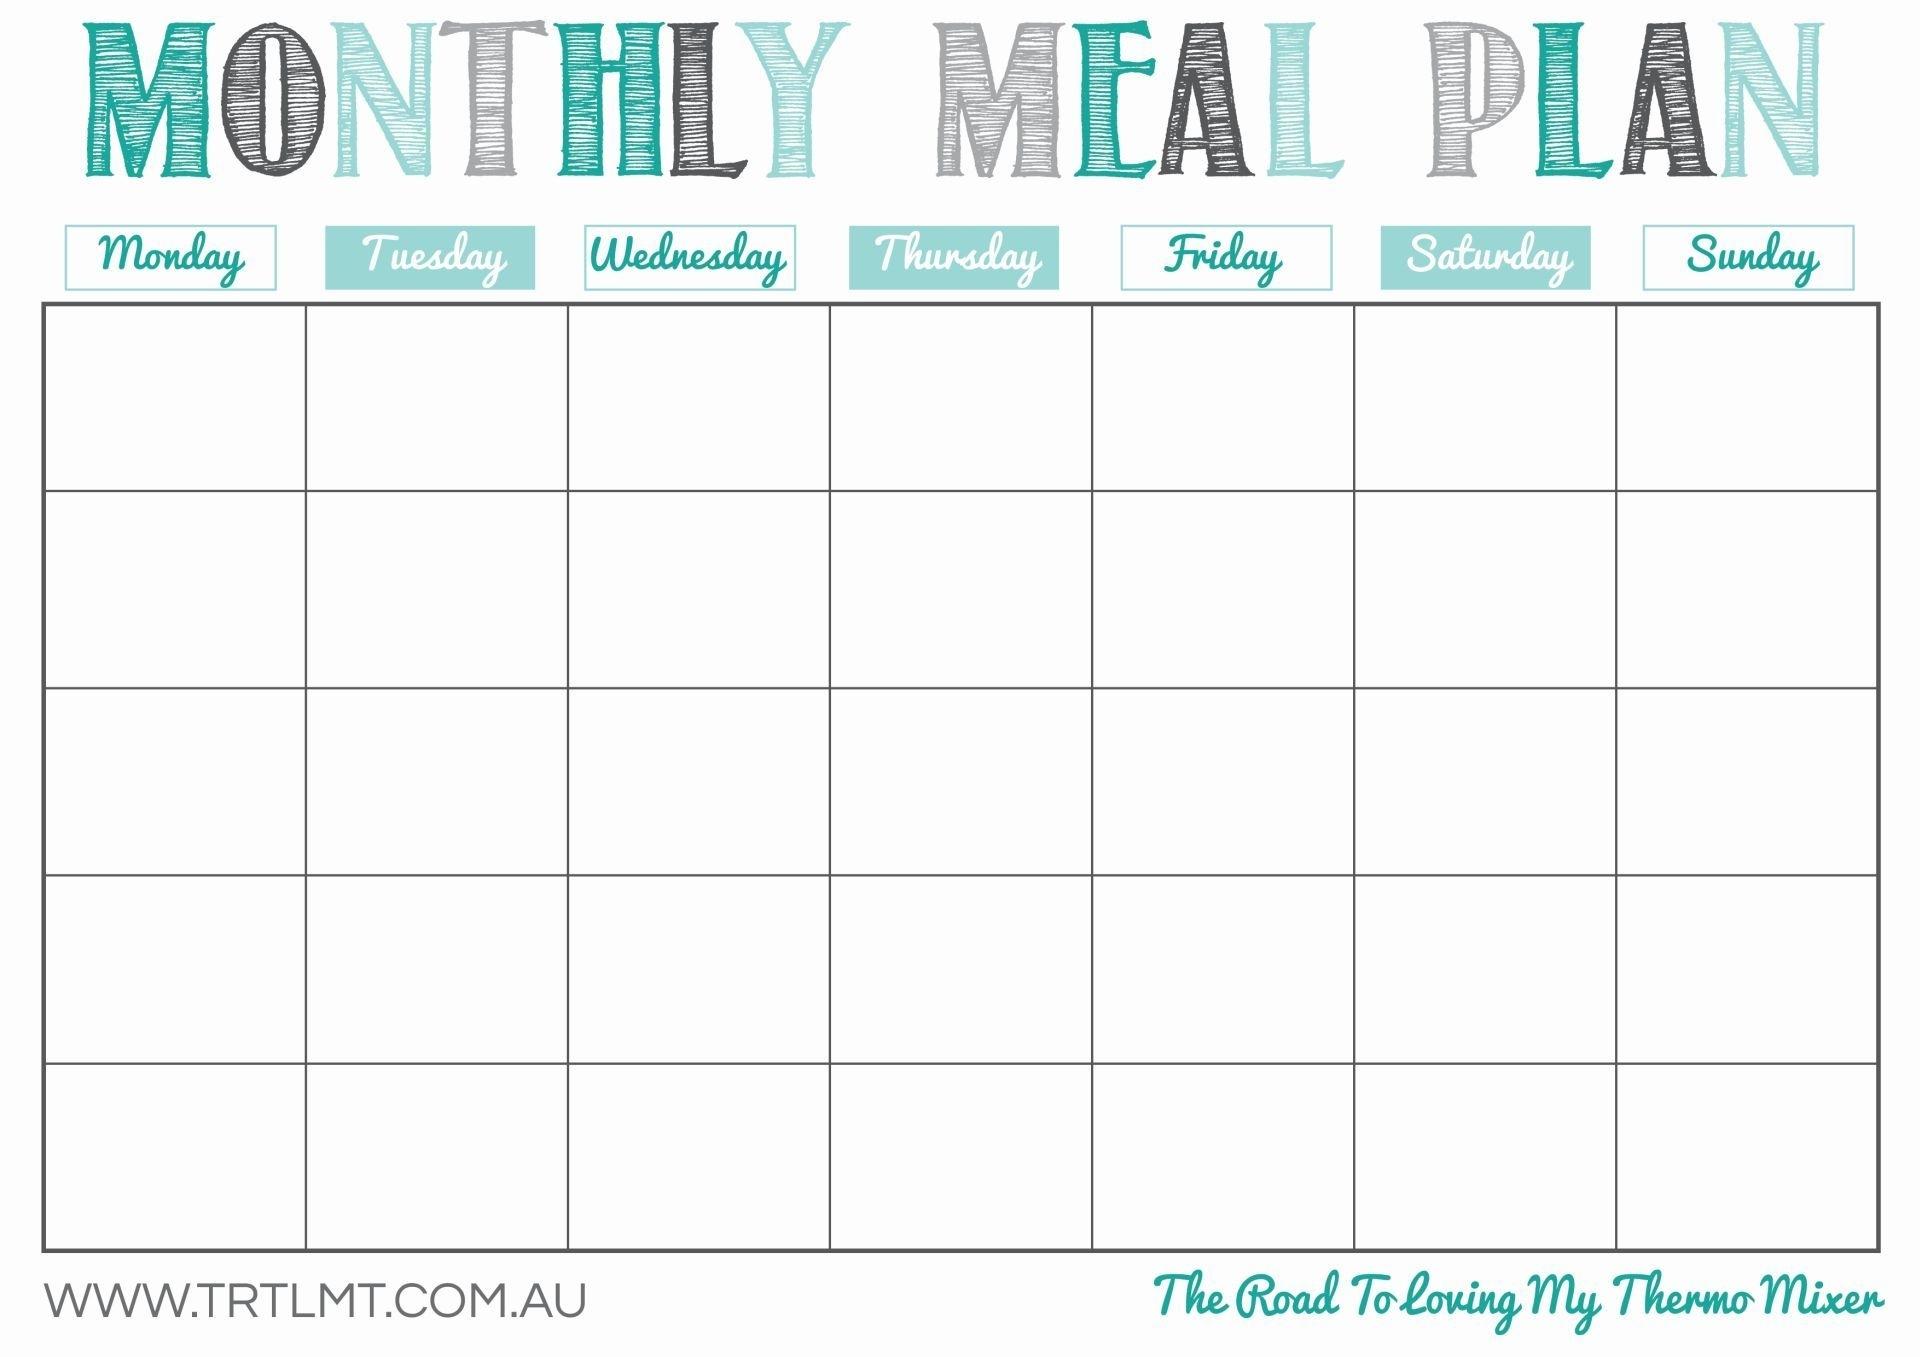 Monthly 5 Week Menu Rotation Template   Template Calendar Printable intended for Monthly 5 Week Menu Rotation Template